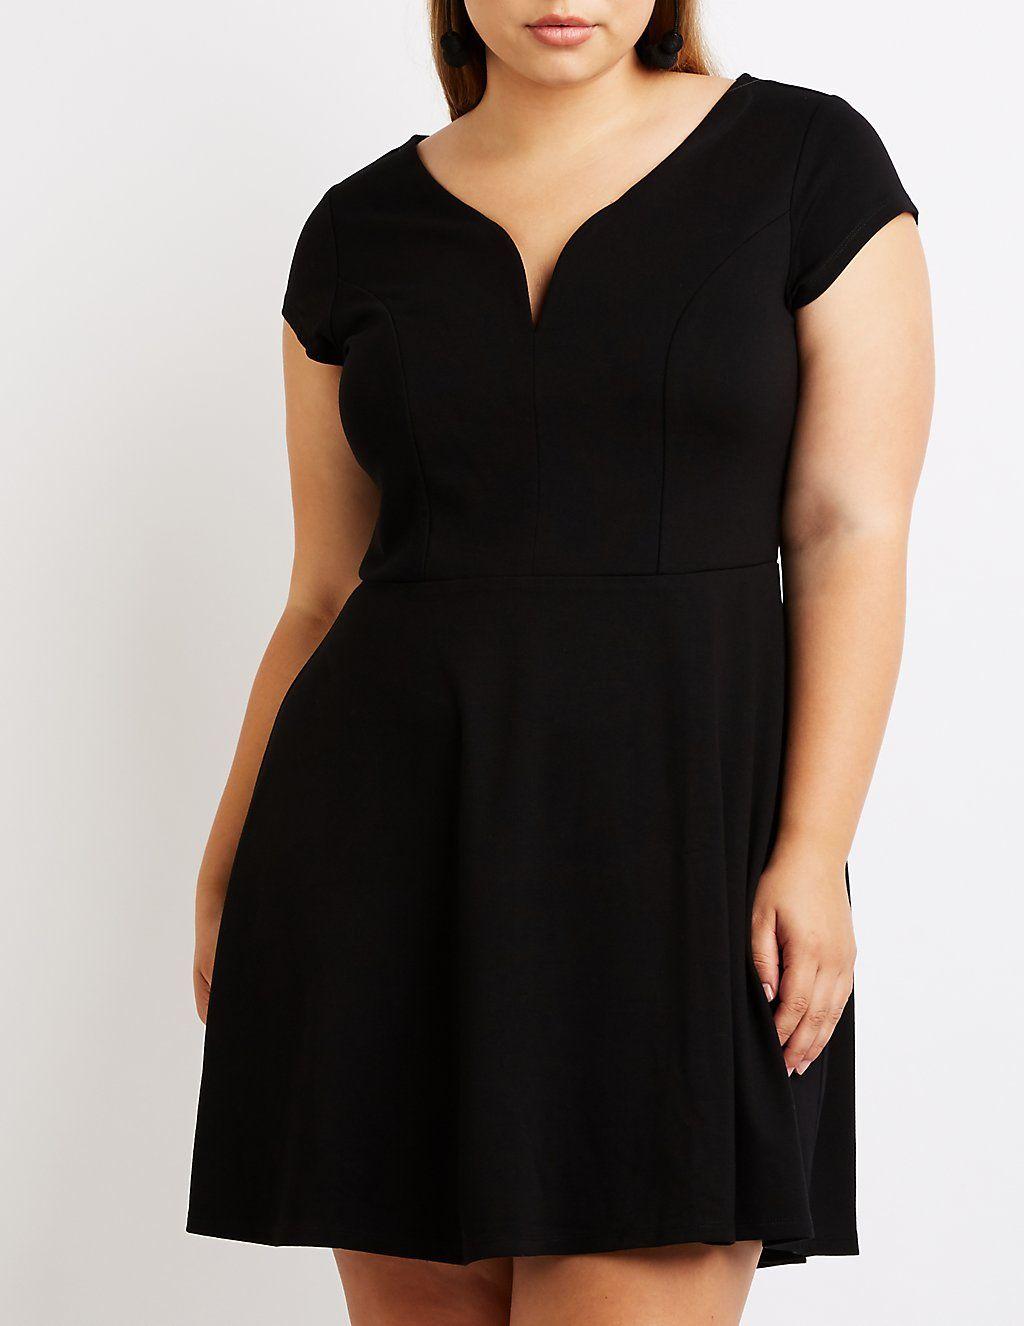 Plus Size Black Dresses Charlotte Russe